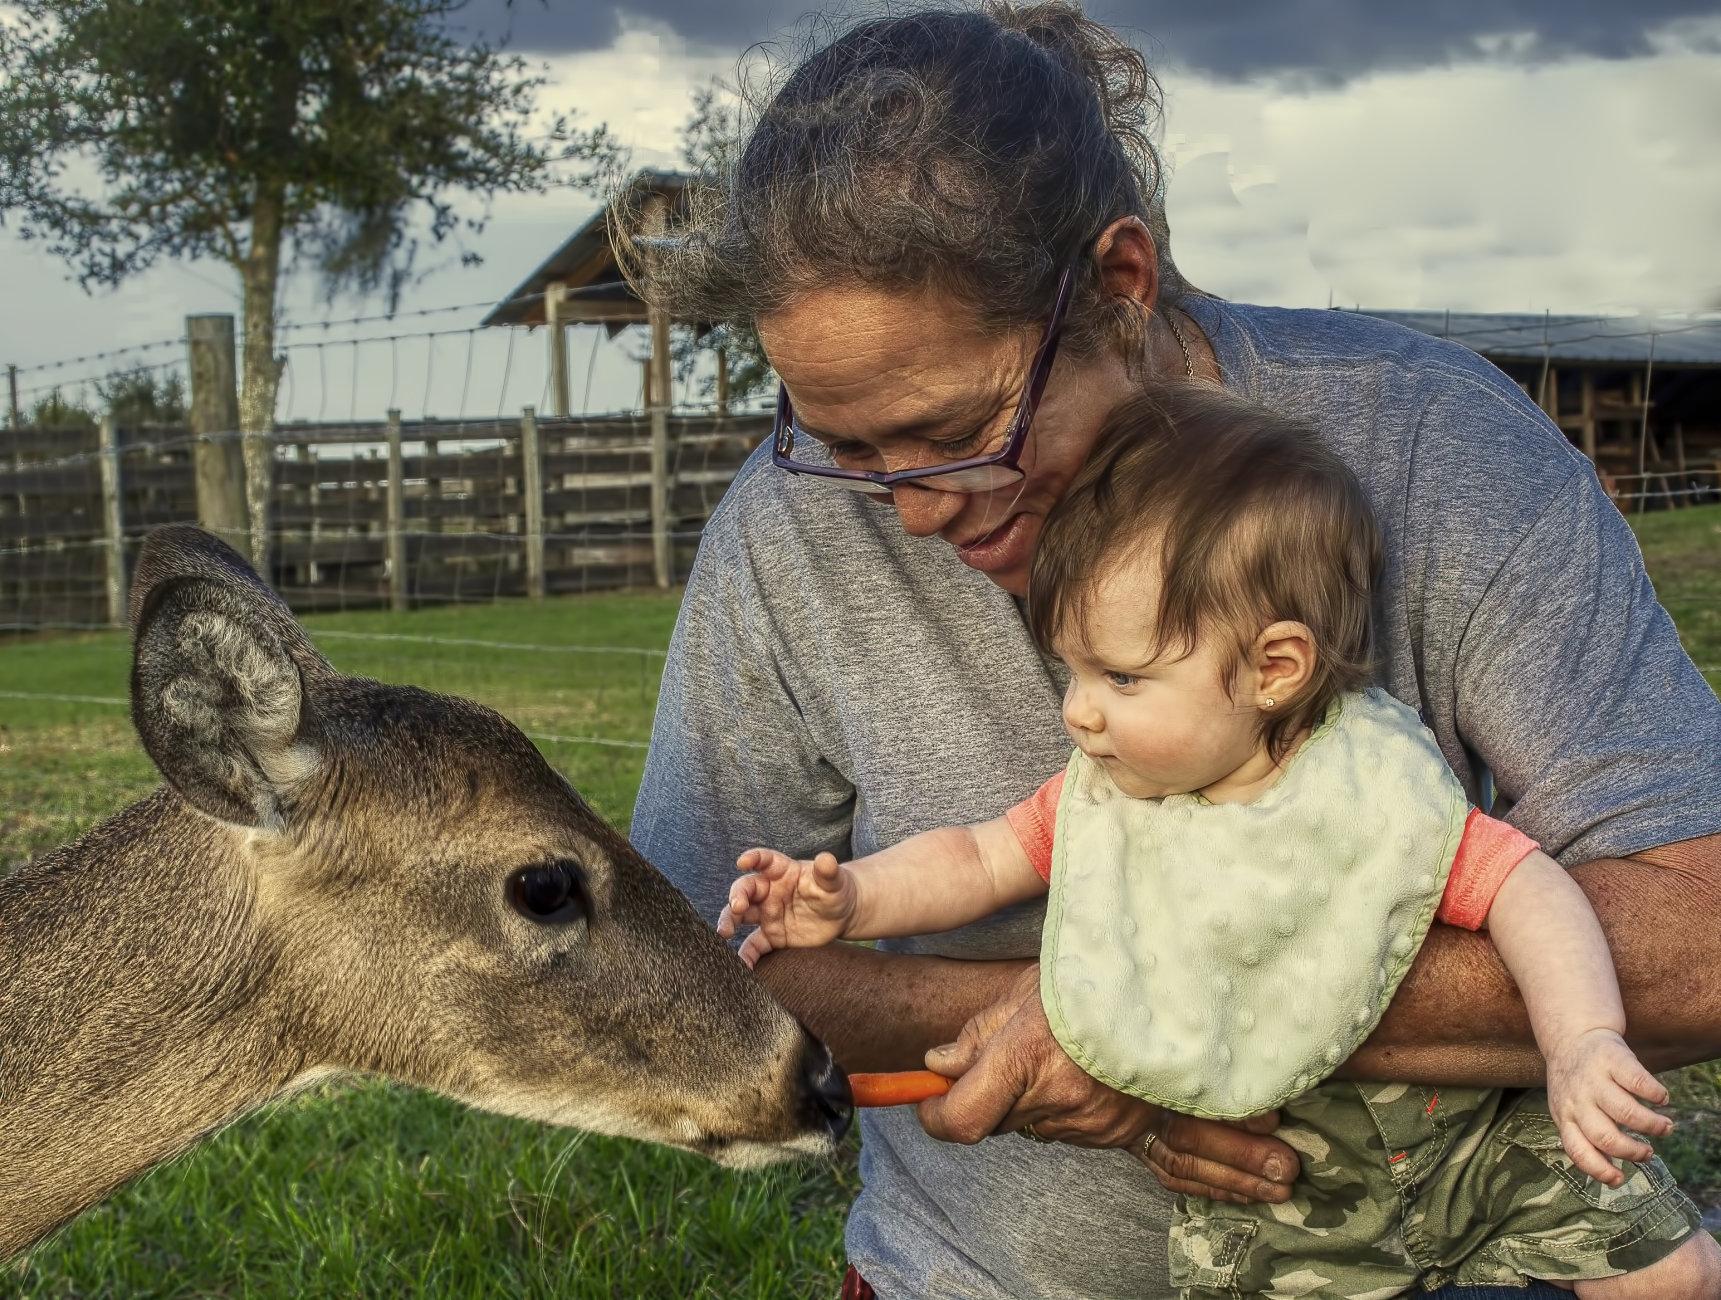 Meeting Lily the deer